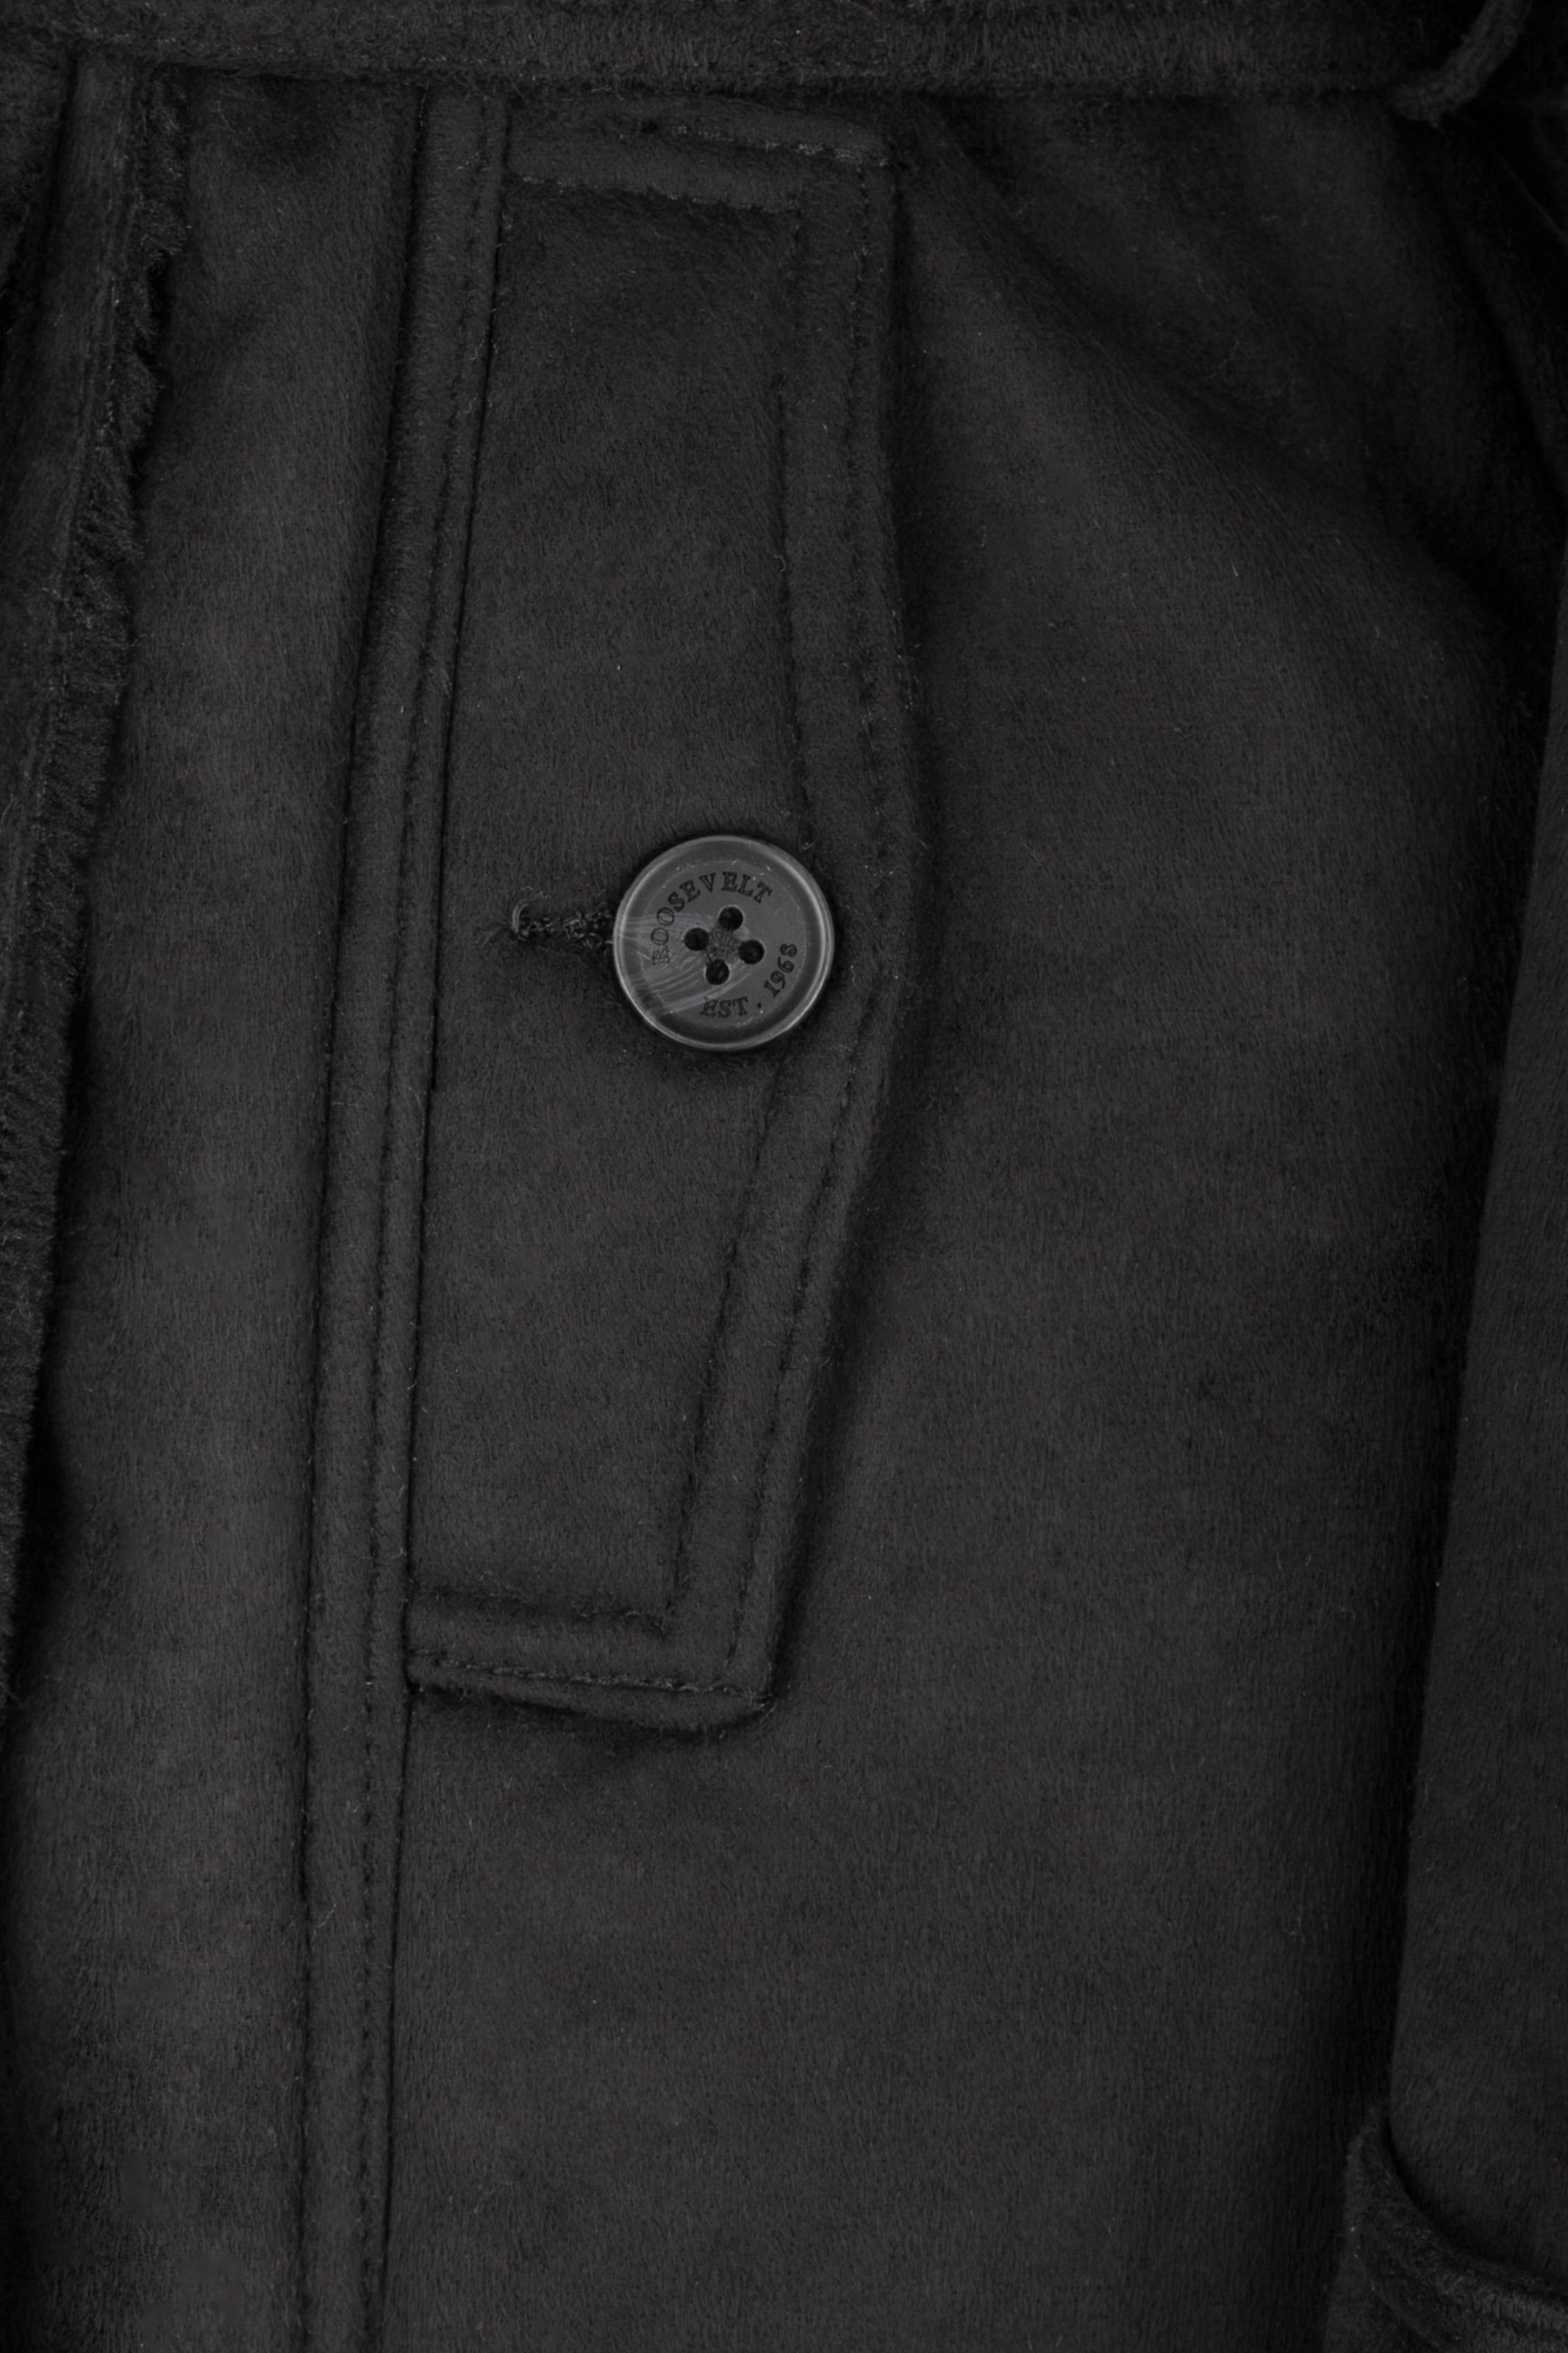 En Veste Noir Noir En Roosevelt Roosevelt Veste En D'hiver Veste D'hiver Roosevelt D'hiver v80wmNn